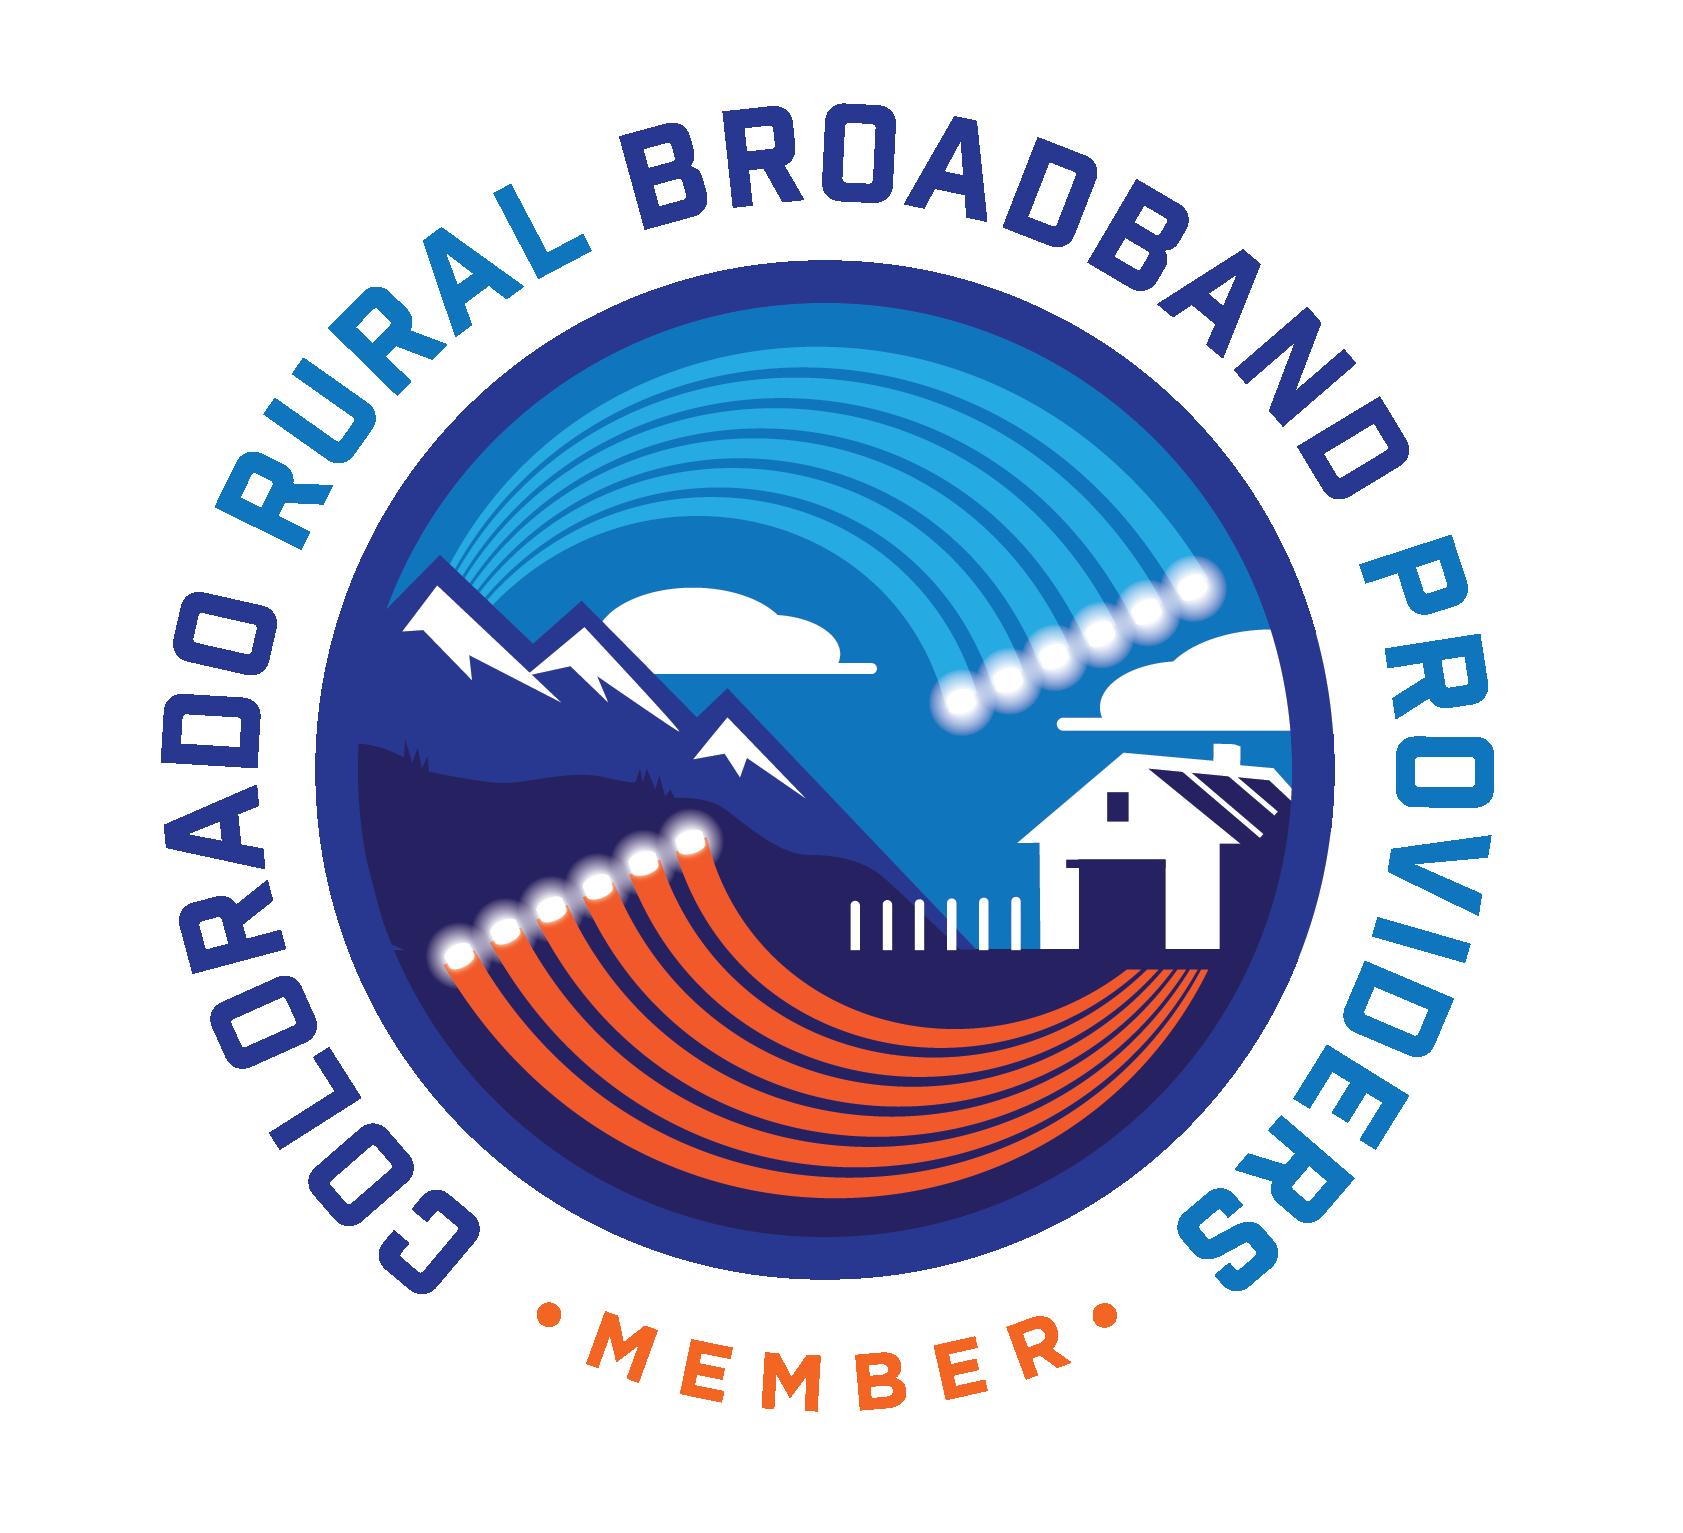 CoRuralBroadNet_Logo_Member.png